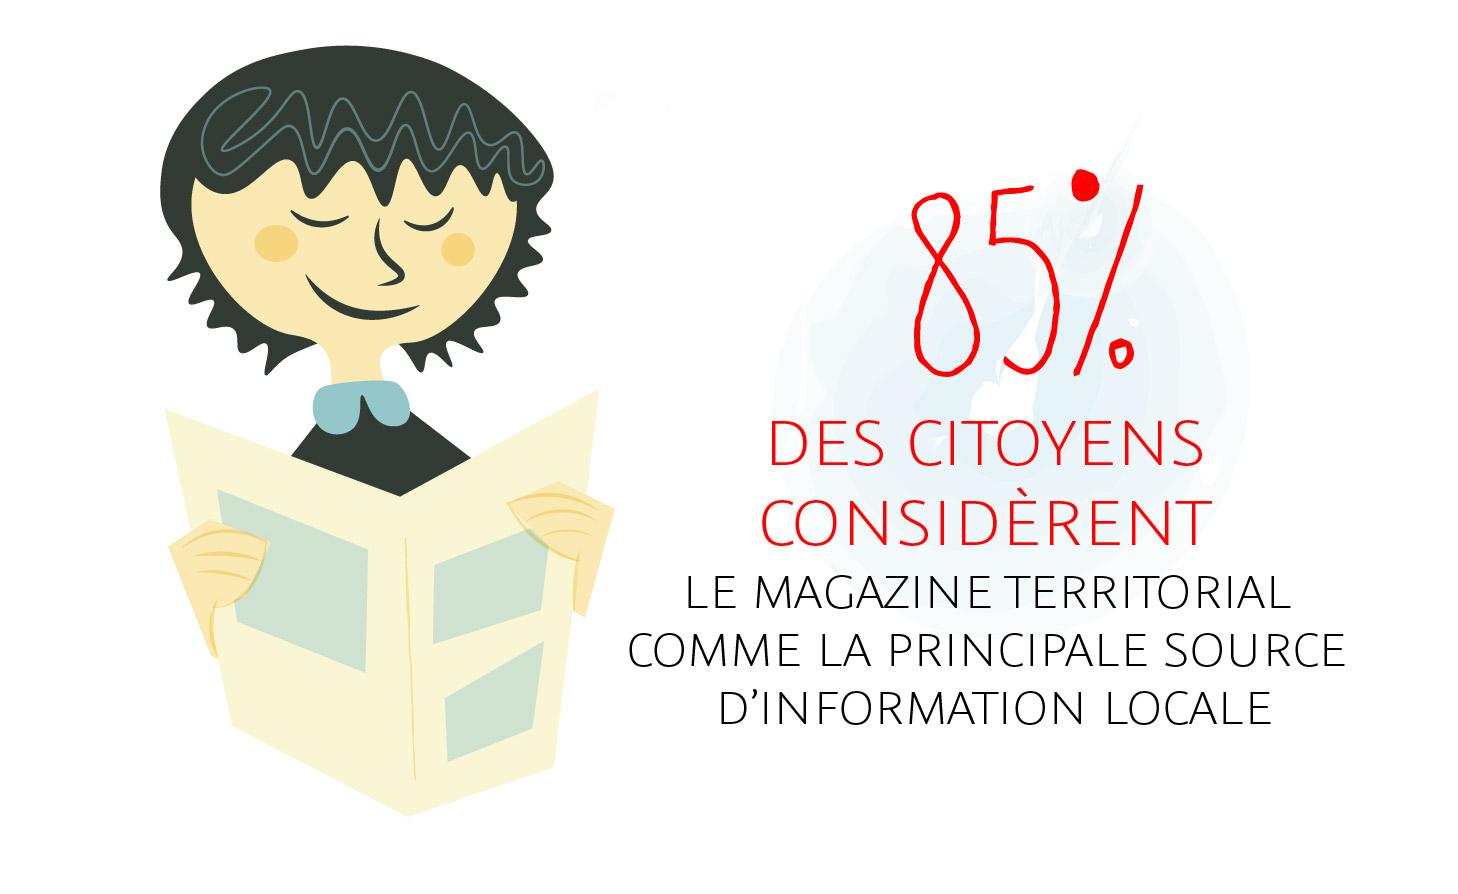 Création de magazine territorial